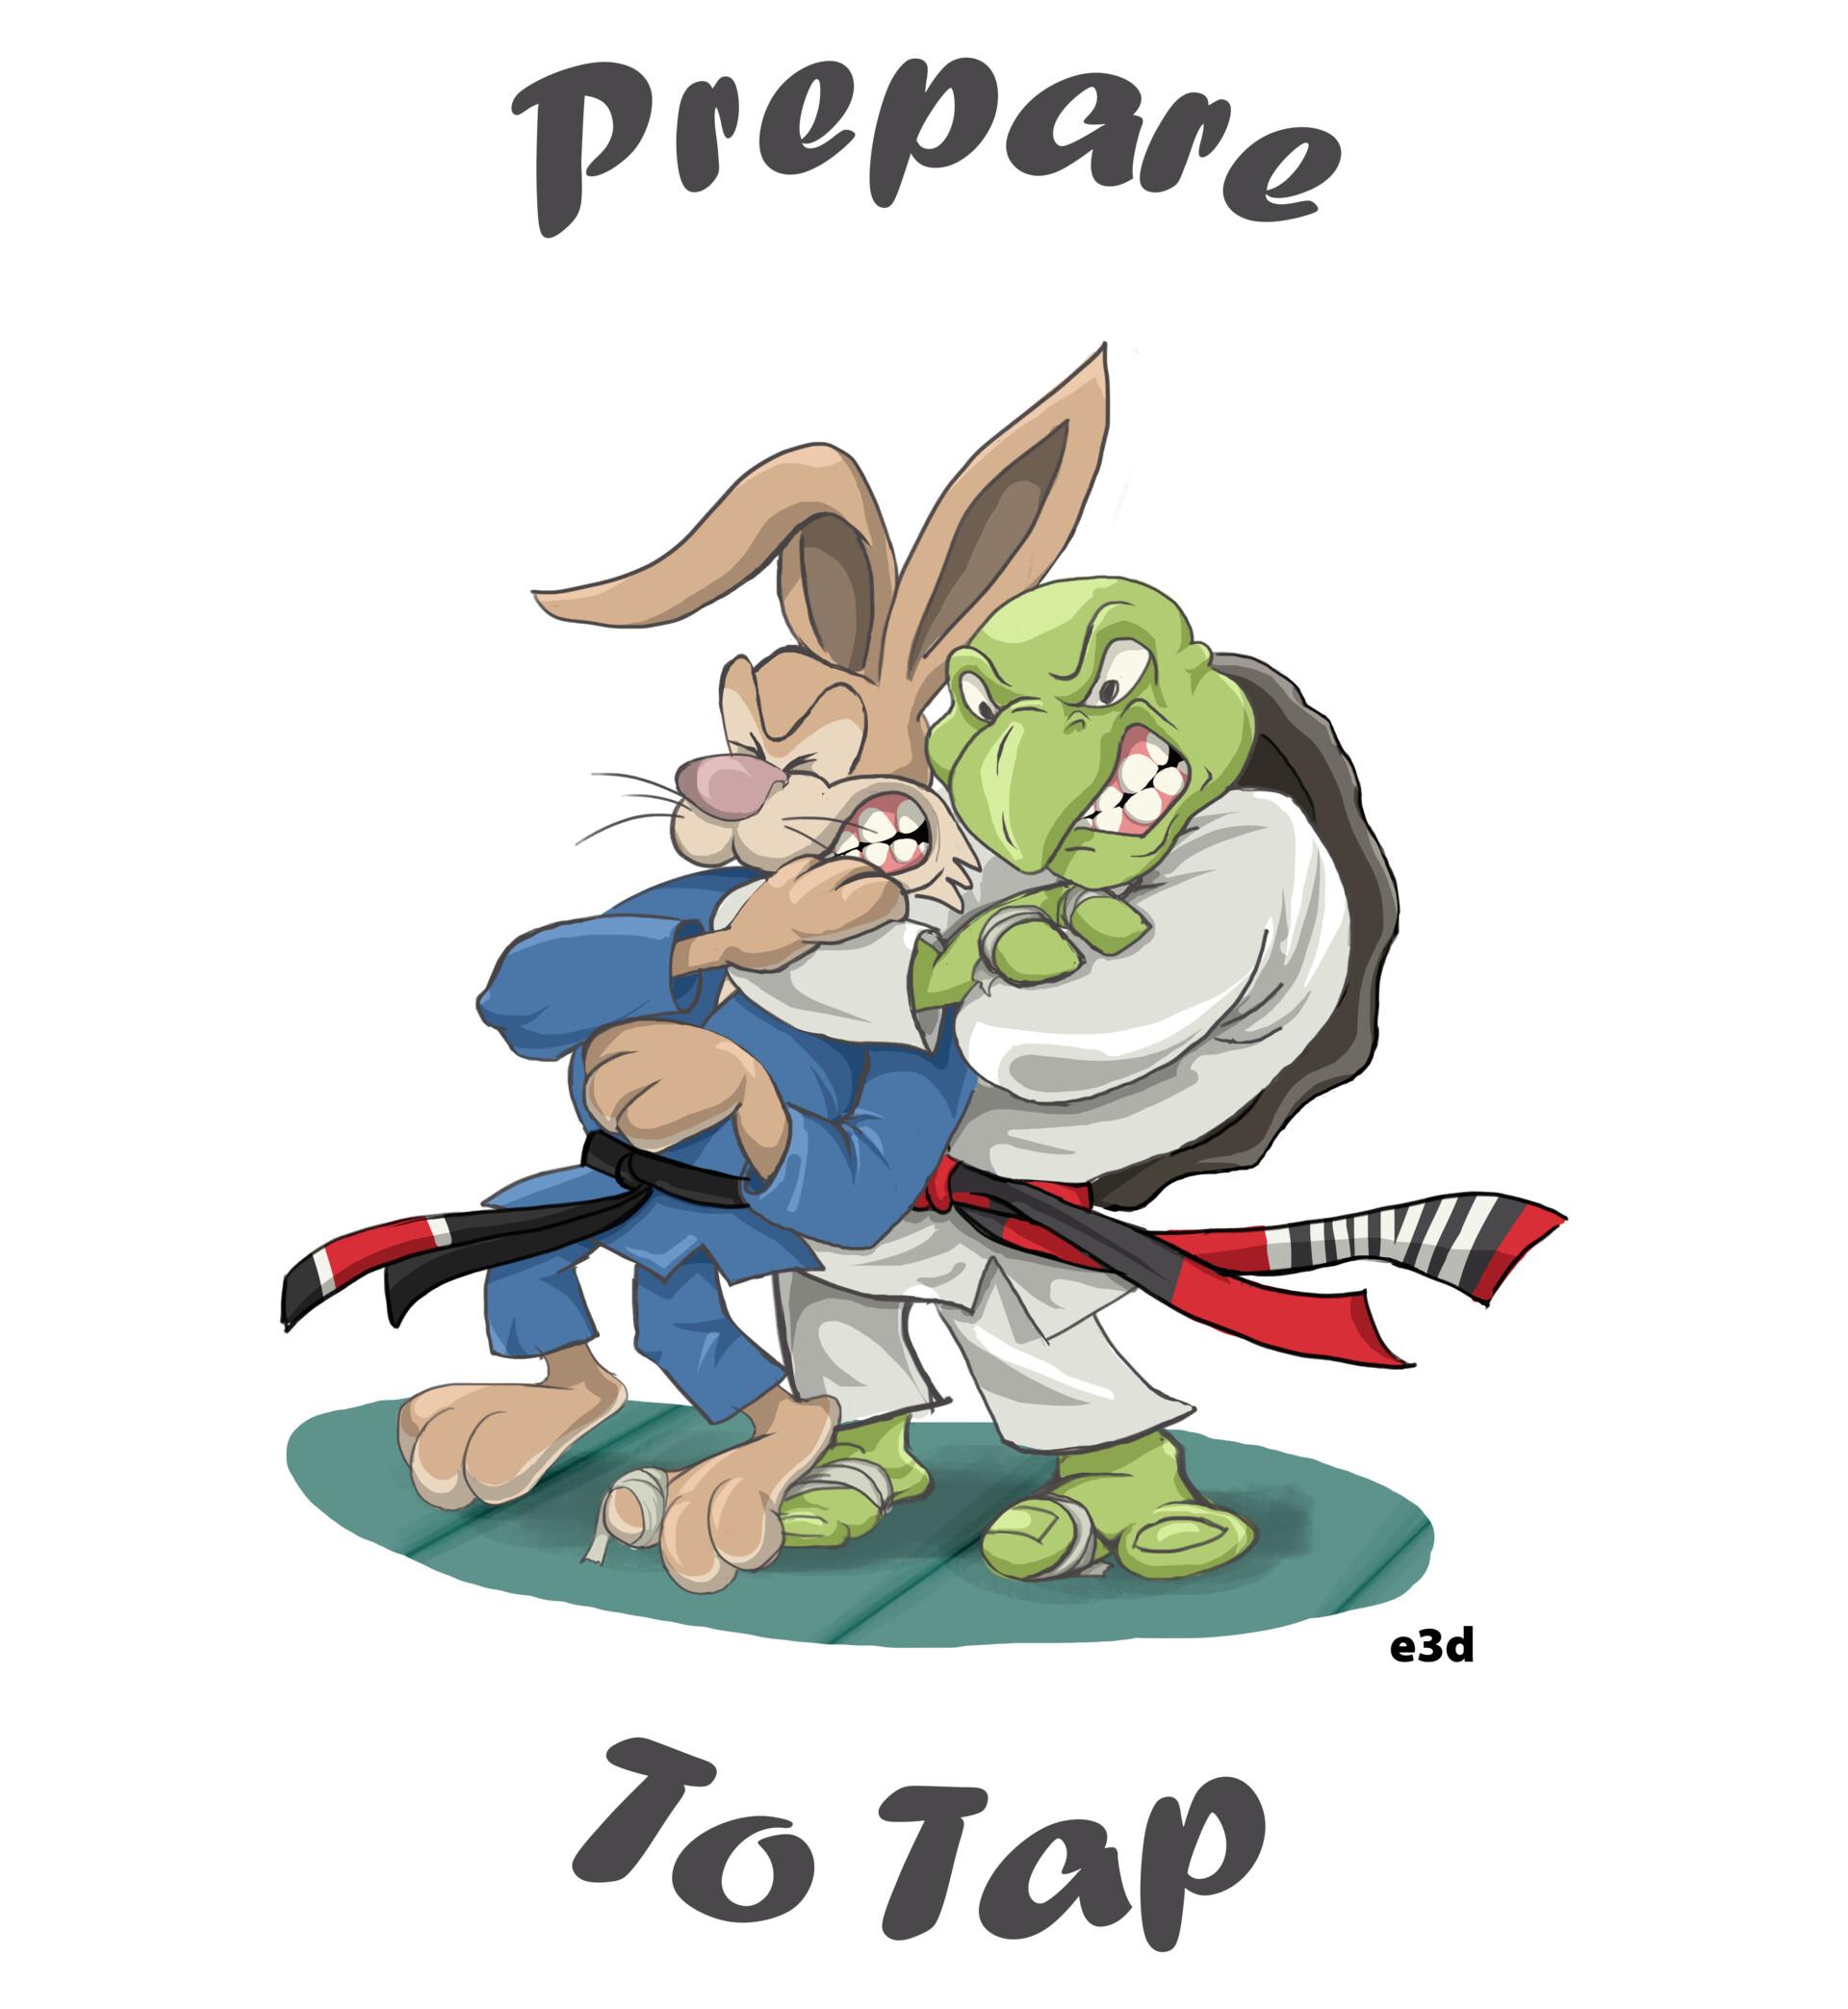 designed for the sport of  Jiu-jitsu